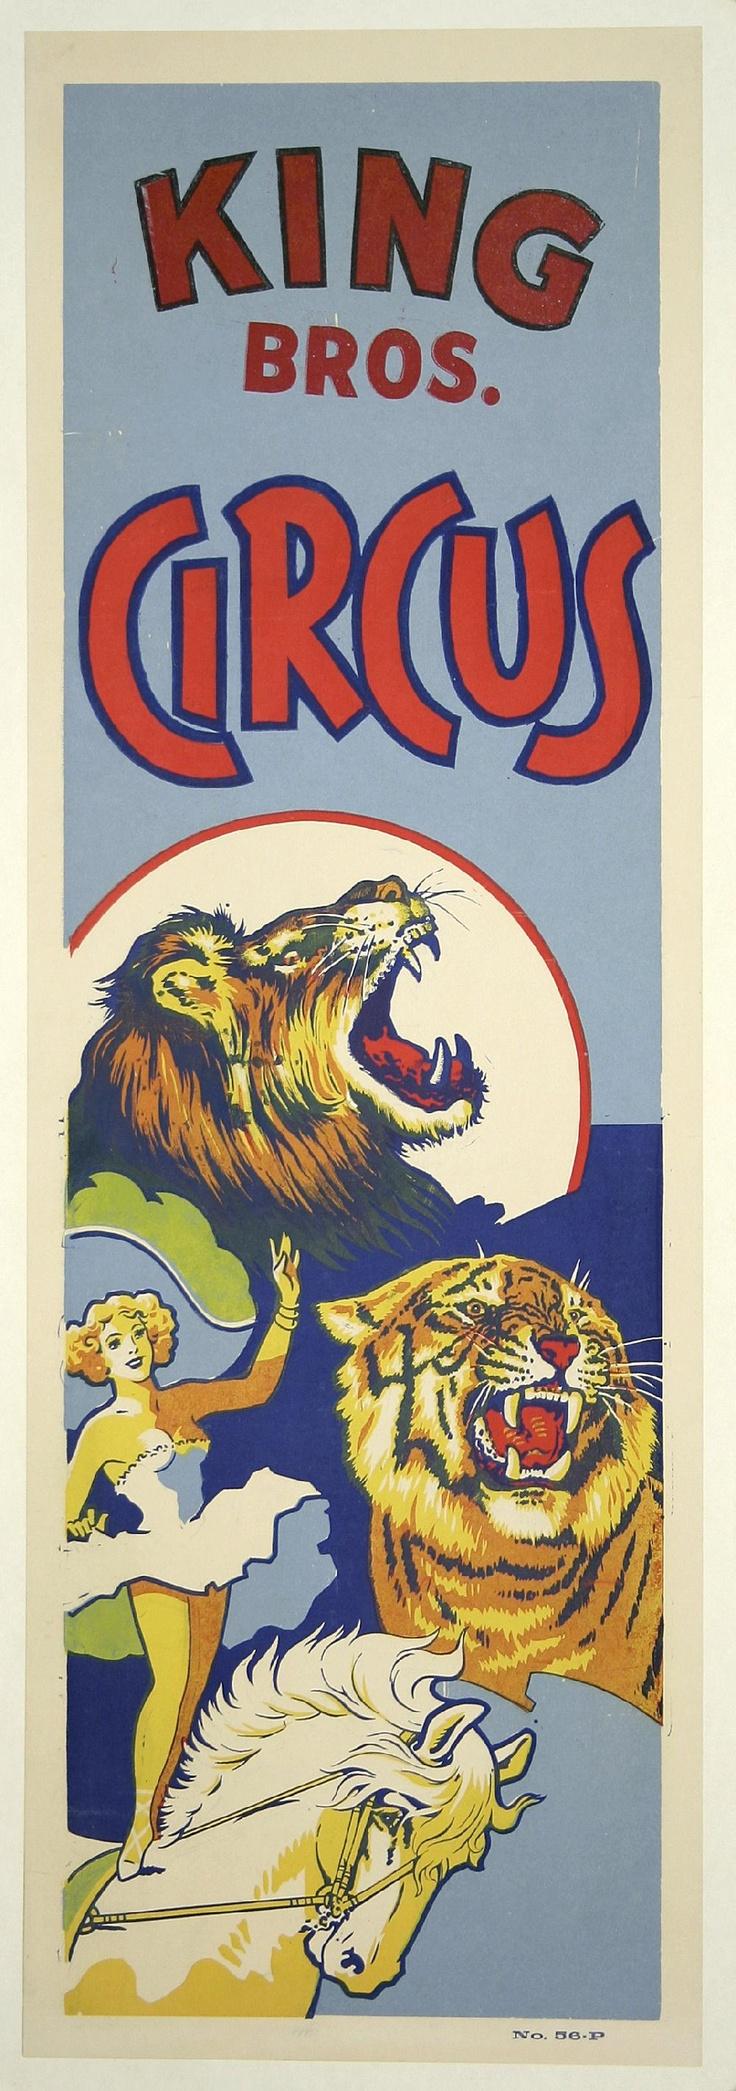 King Bros Circus